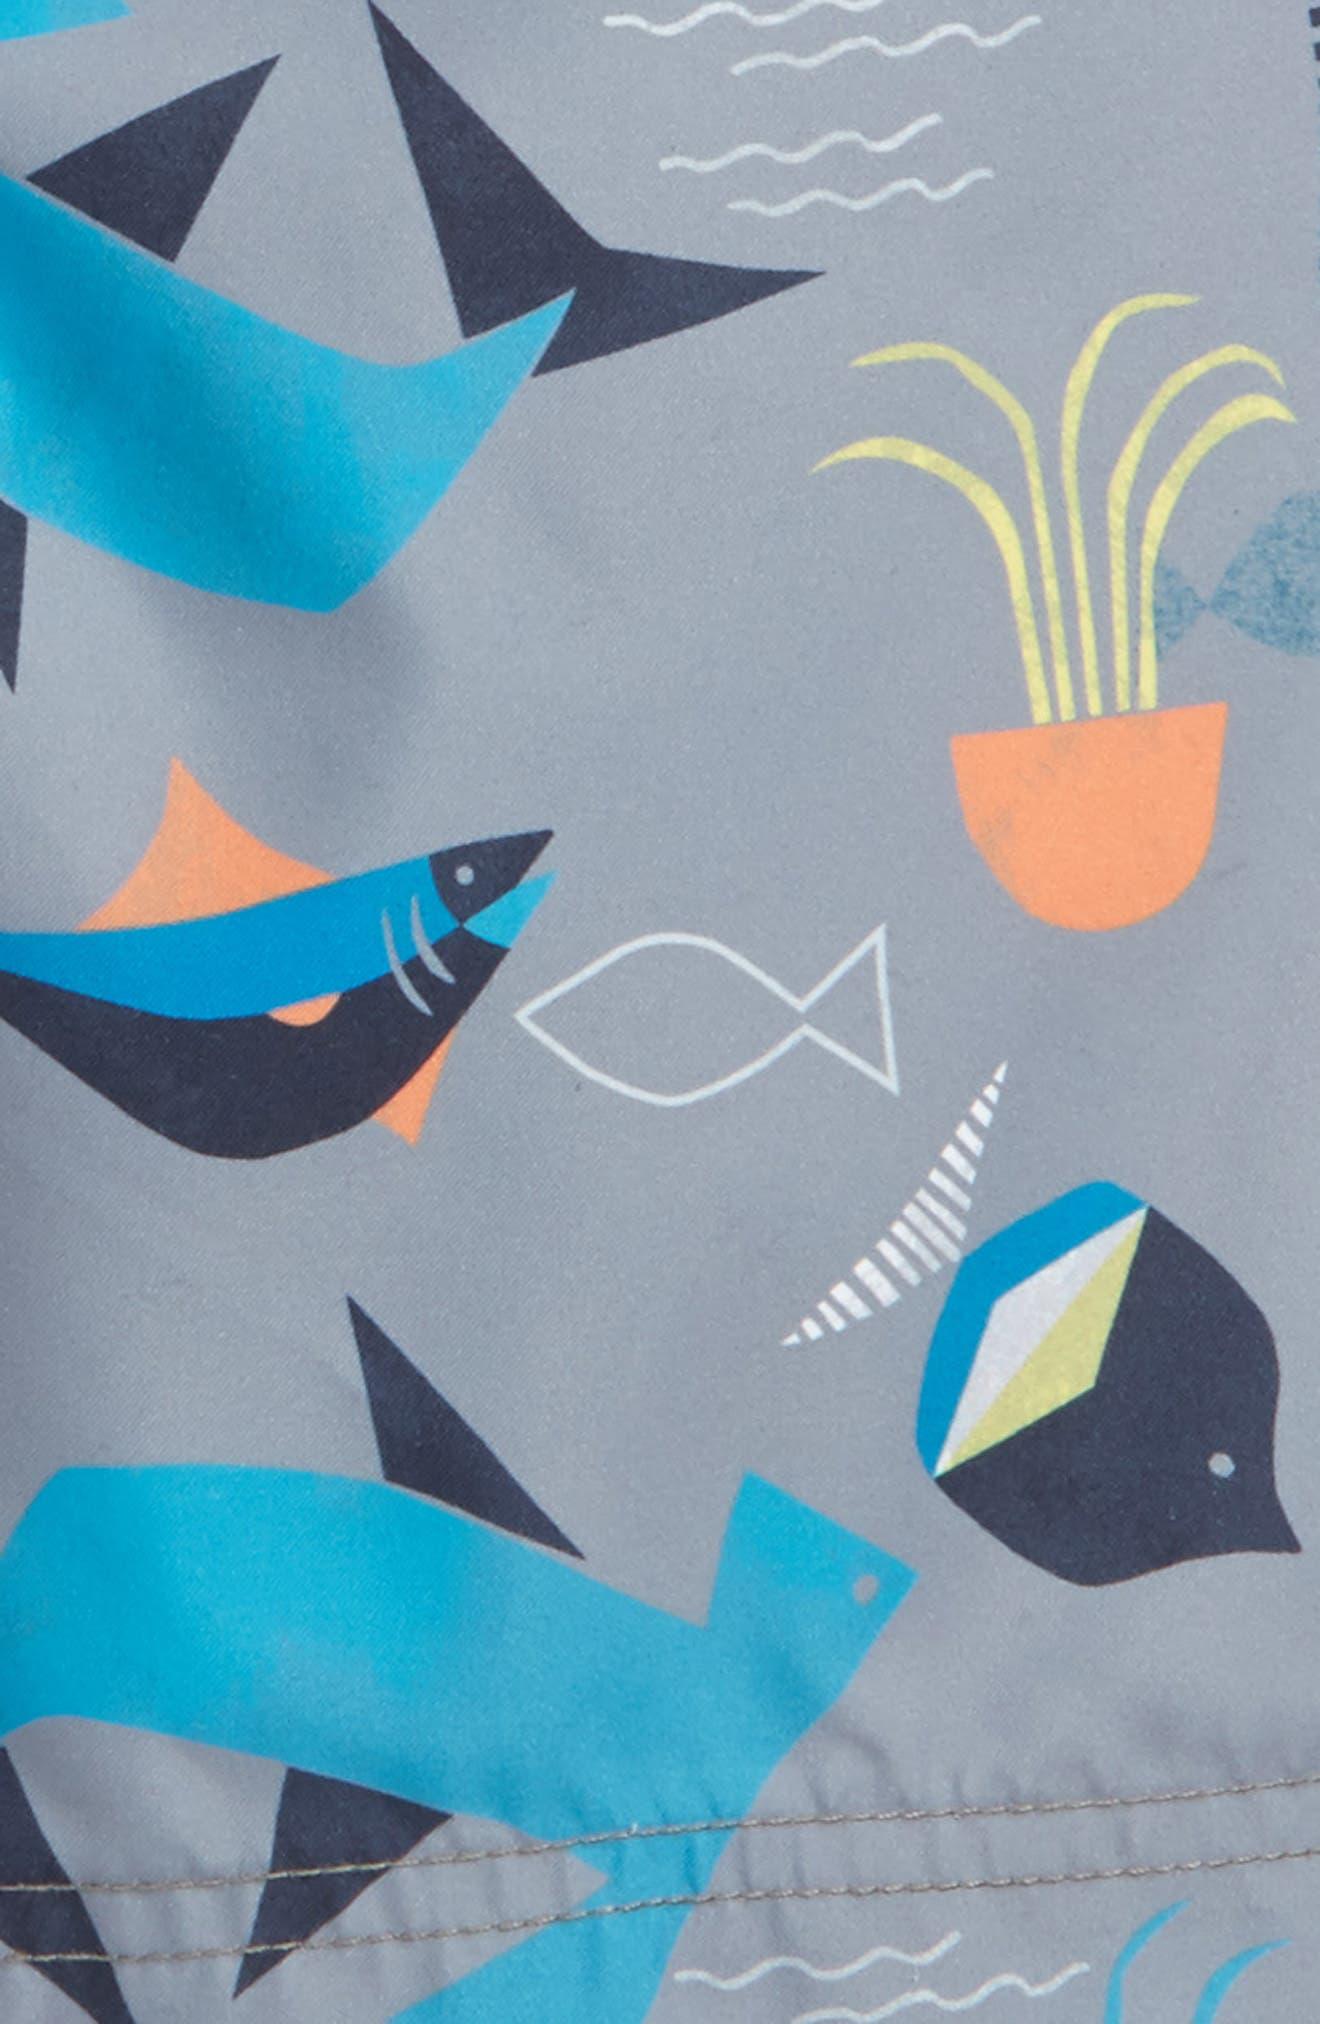 Salt Water Swim Trunks,                             Alternate thumbnail 2, color,                             Raincloud